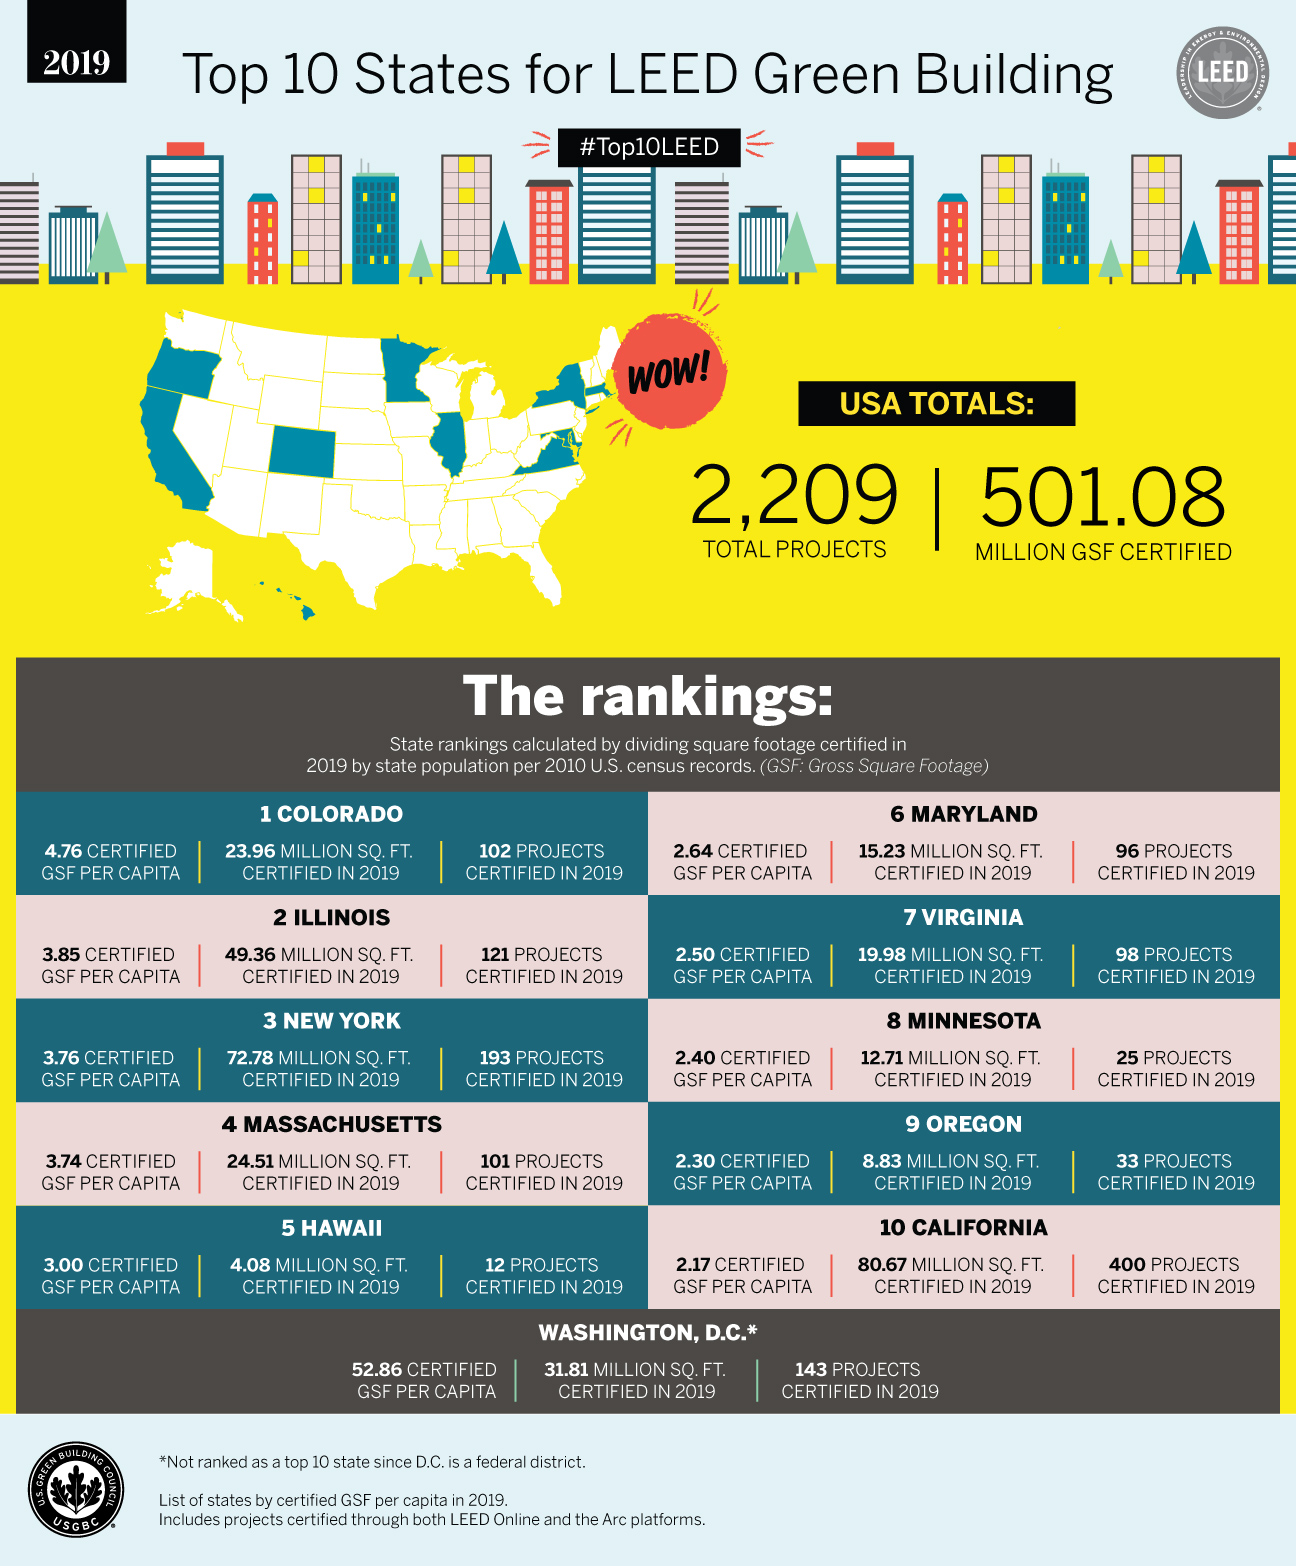 USGBC_top-10-states-2019-print-graphic_V4_AC.jpg